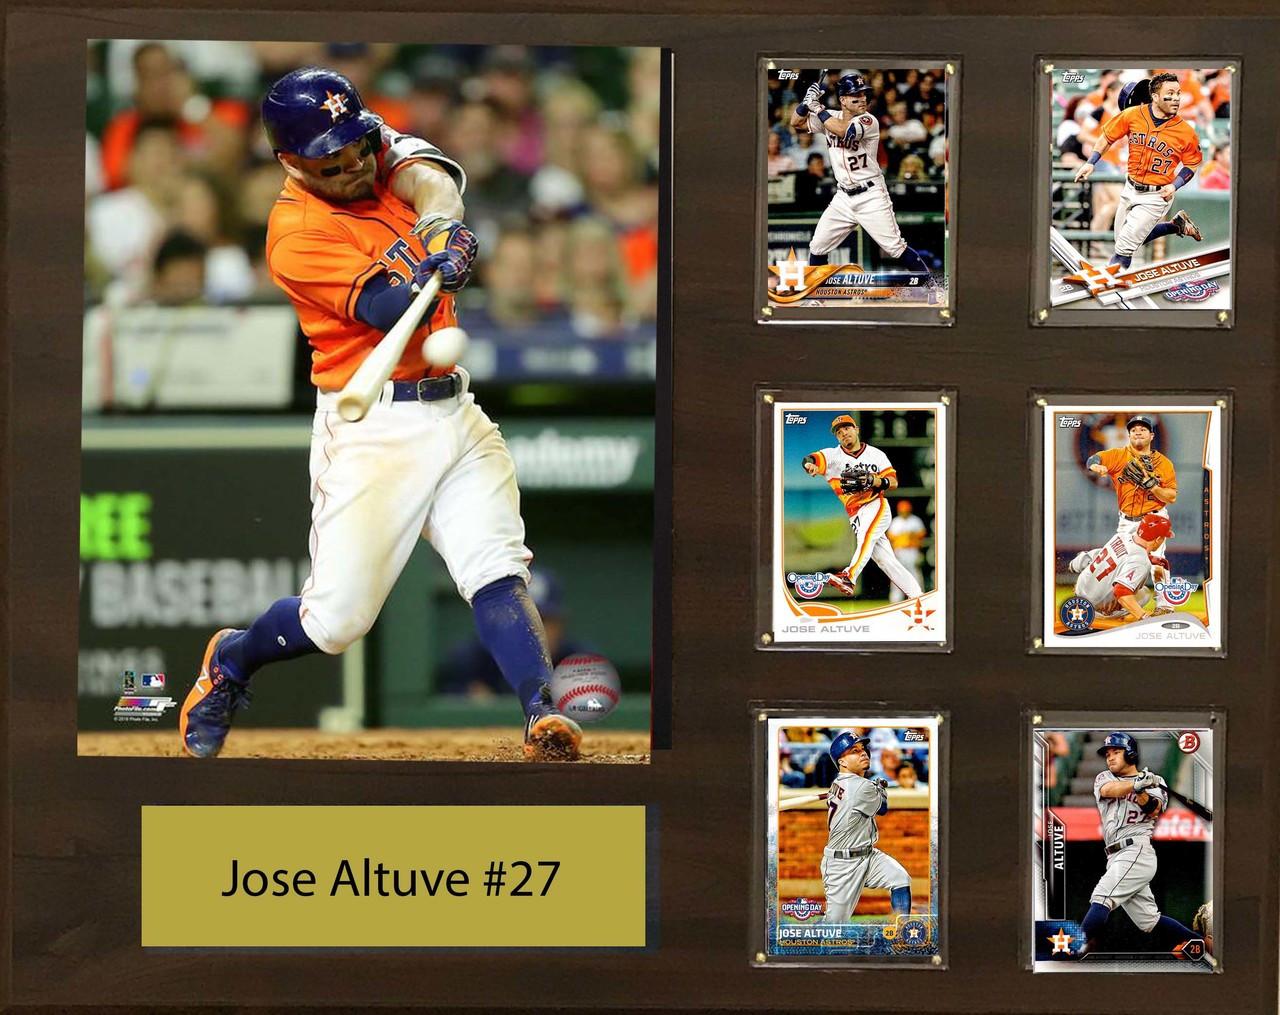 best website ffff5 f01e1 Jose Altuve, Houston Astros, 16x20 Plaque - 8x10 Action photo and 6  baseball cards